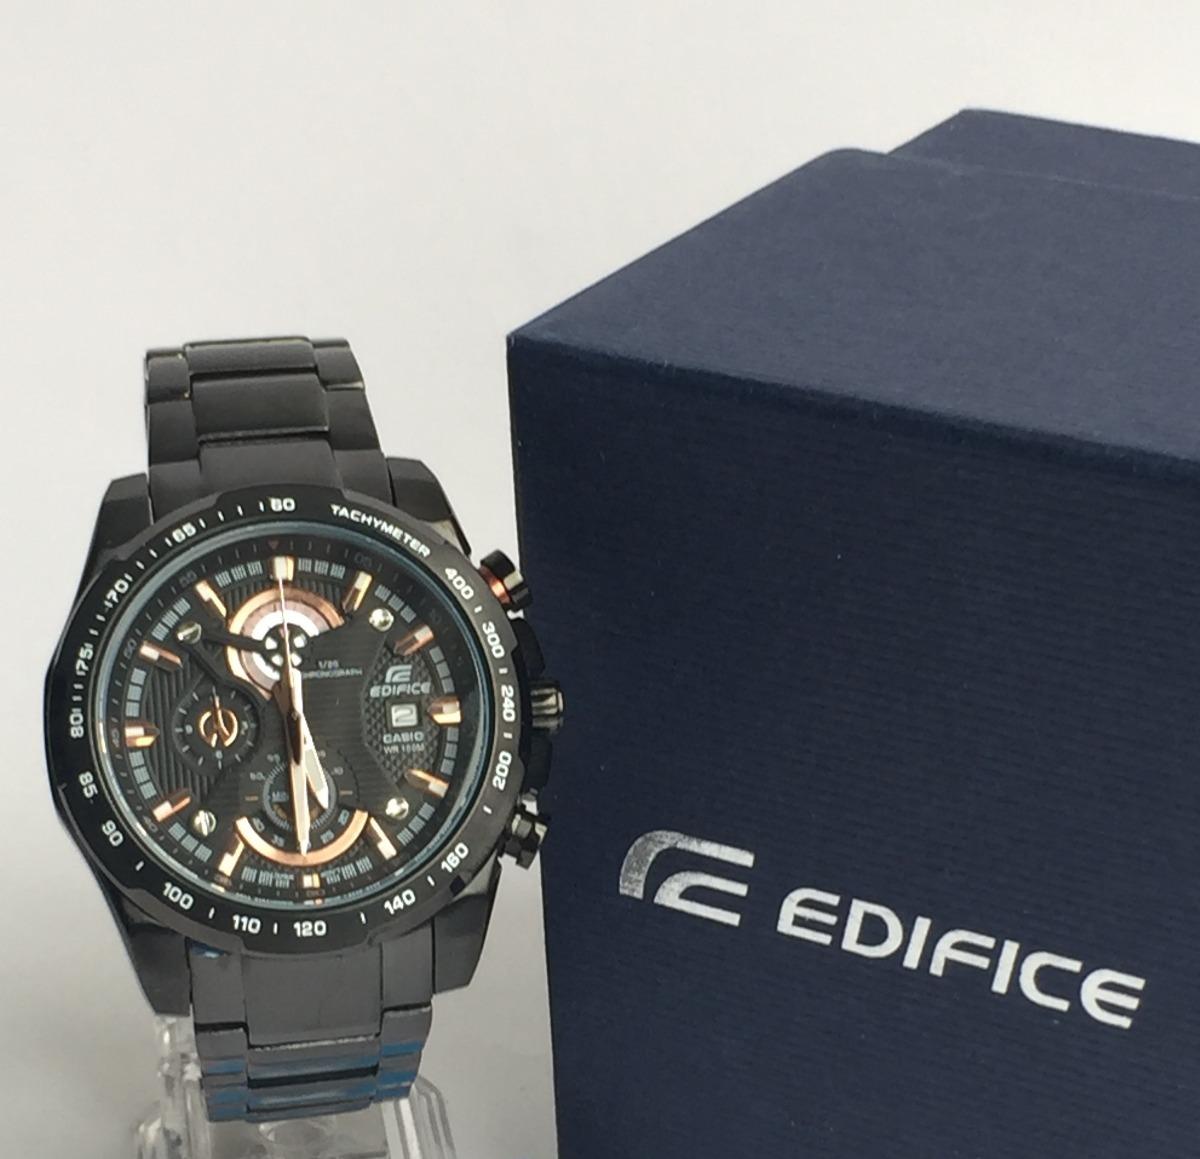 523bk Efr Edifice Modelo Reloj 1avdf 08nNwPkOXZ